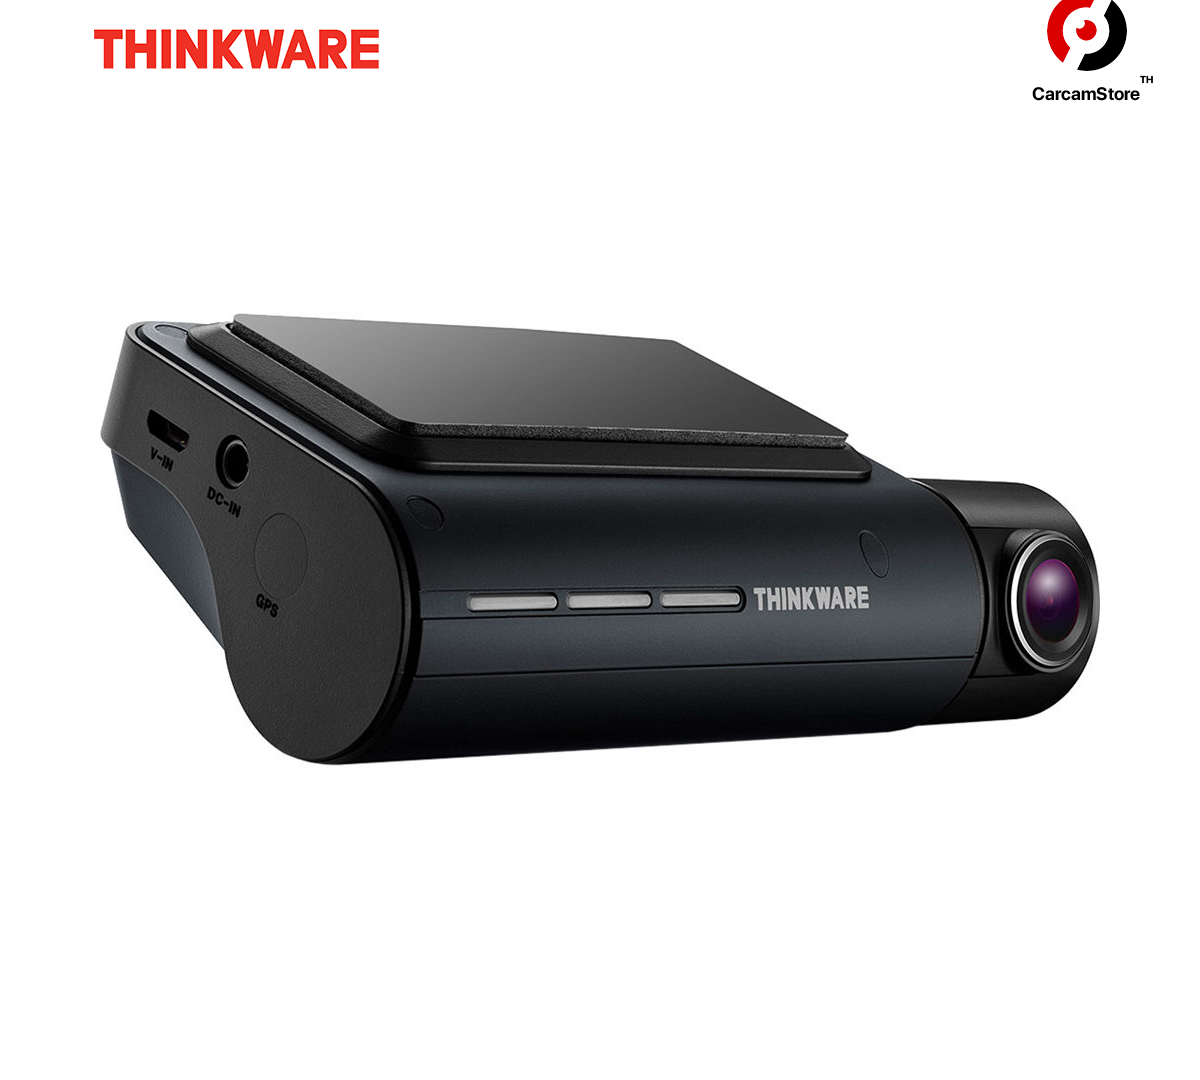 81.pngThinkware Q800 Pro